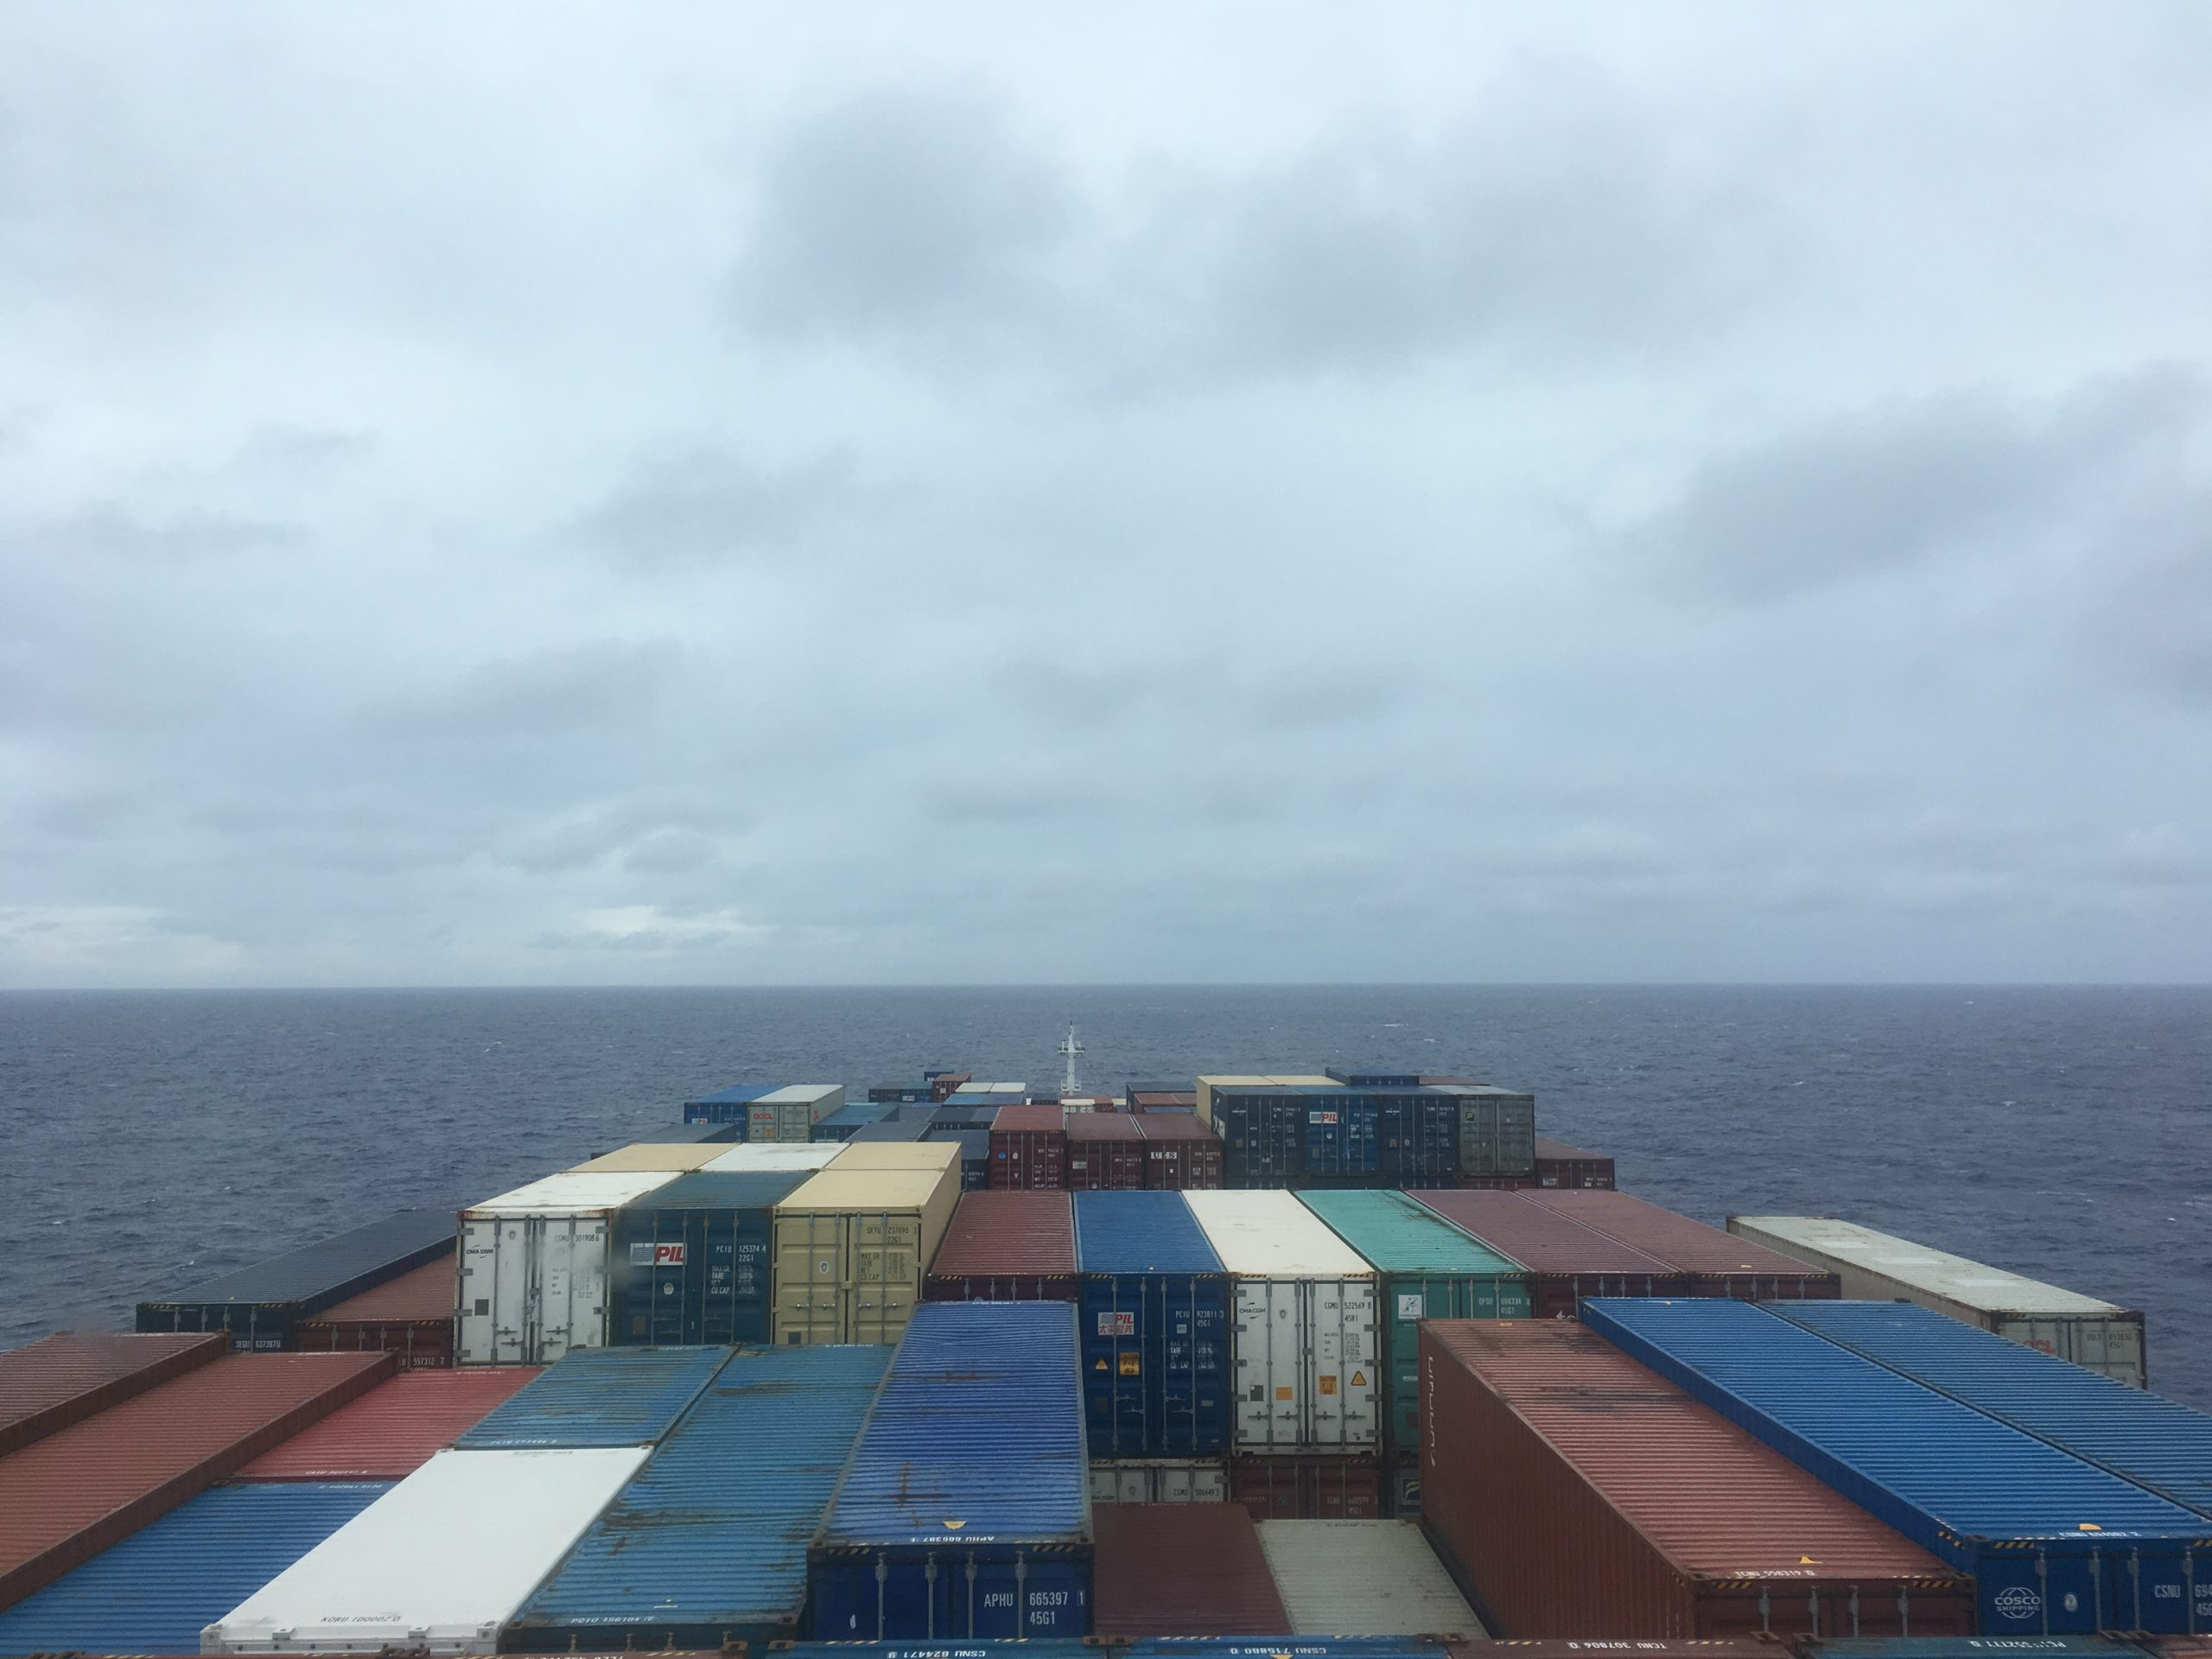 Third day at sea from CC Coral Bridge